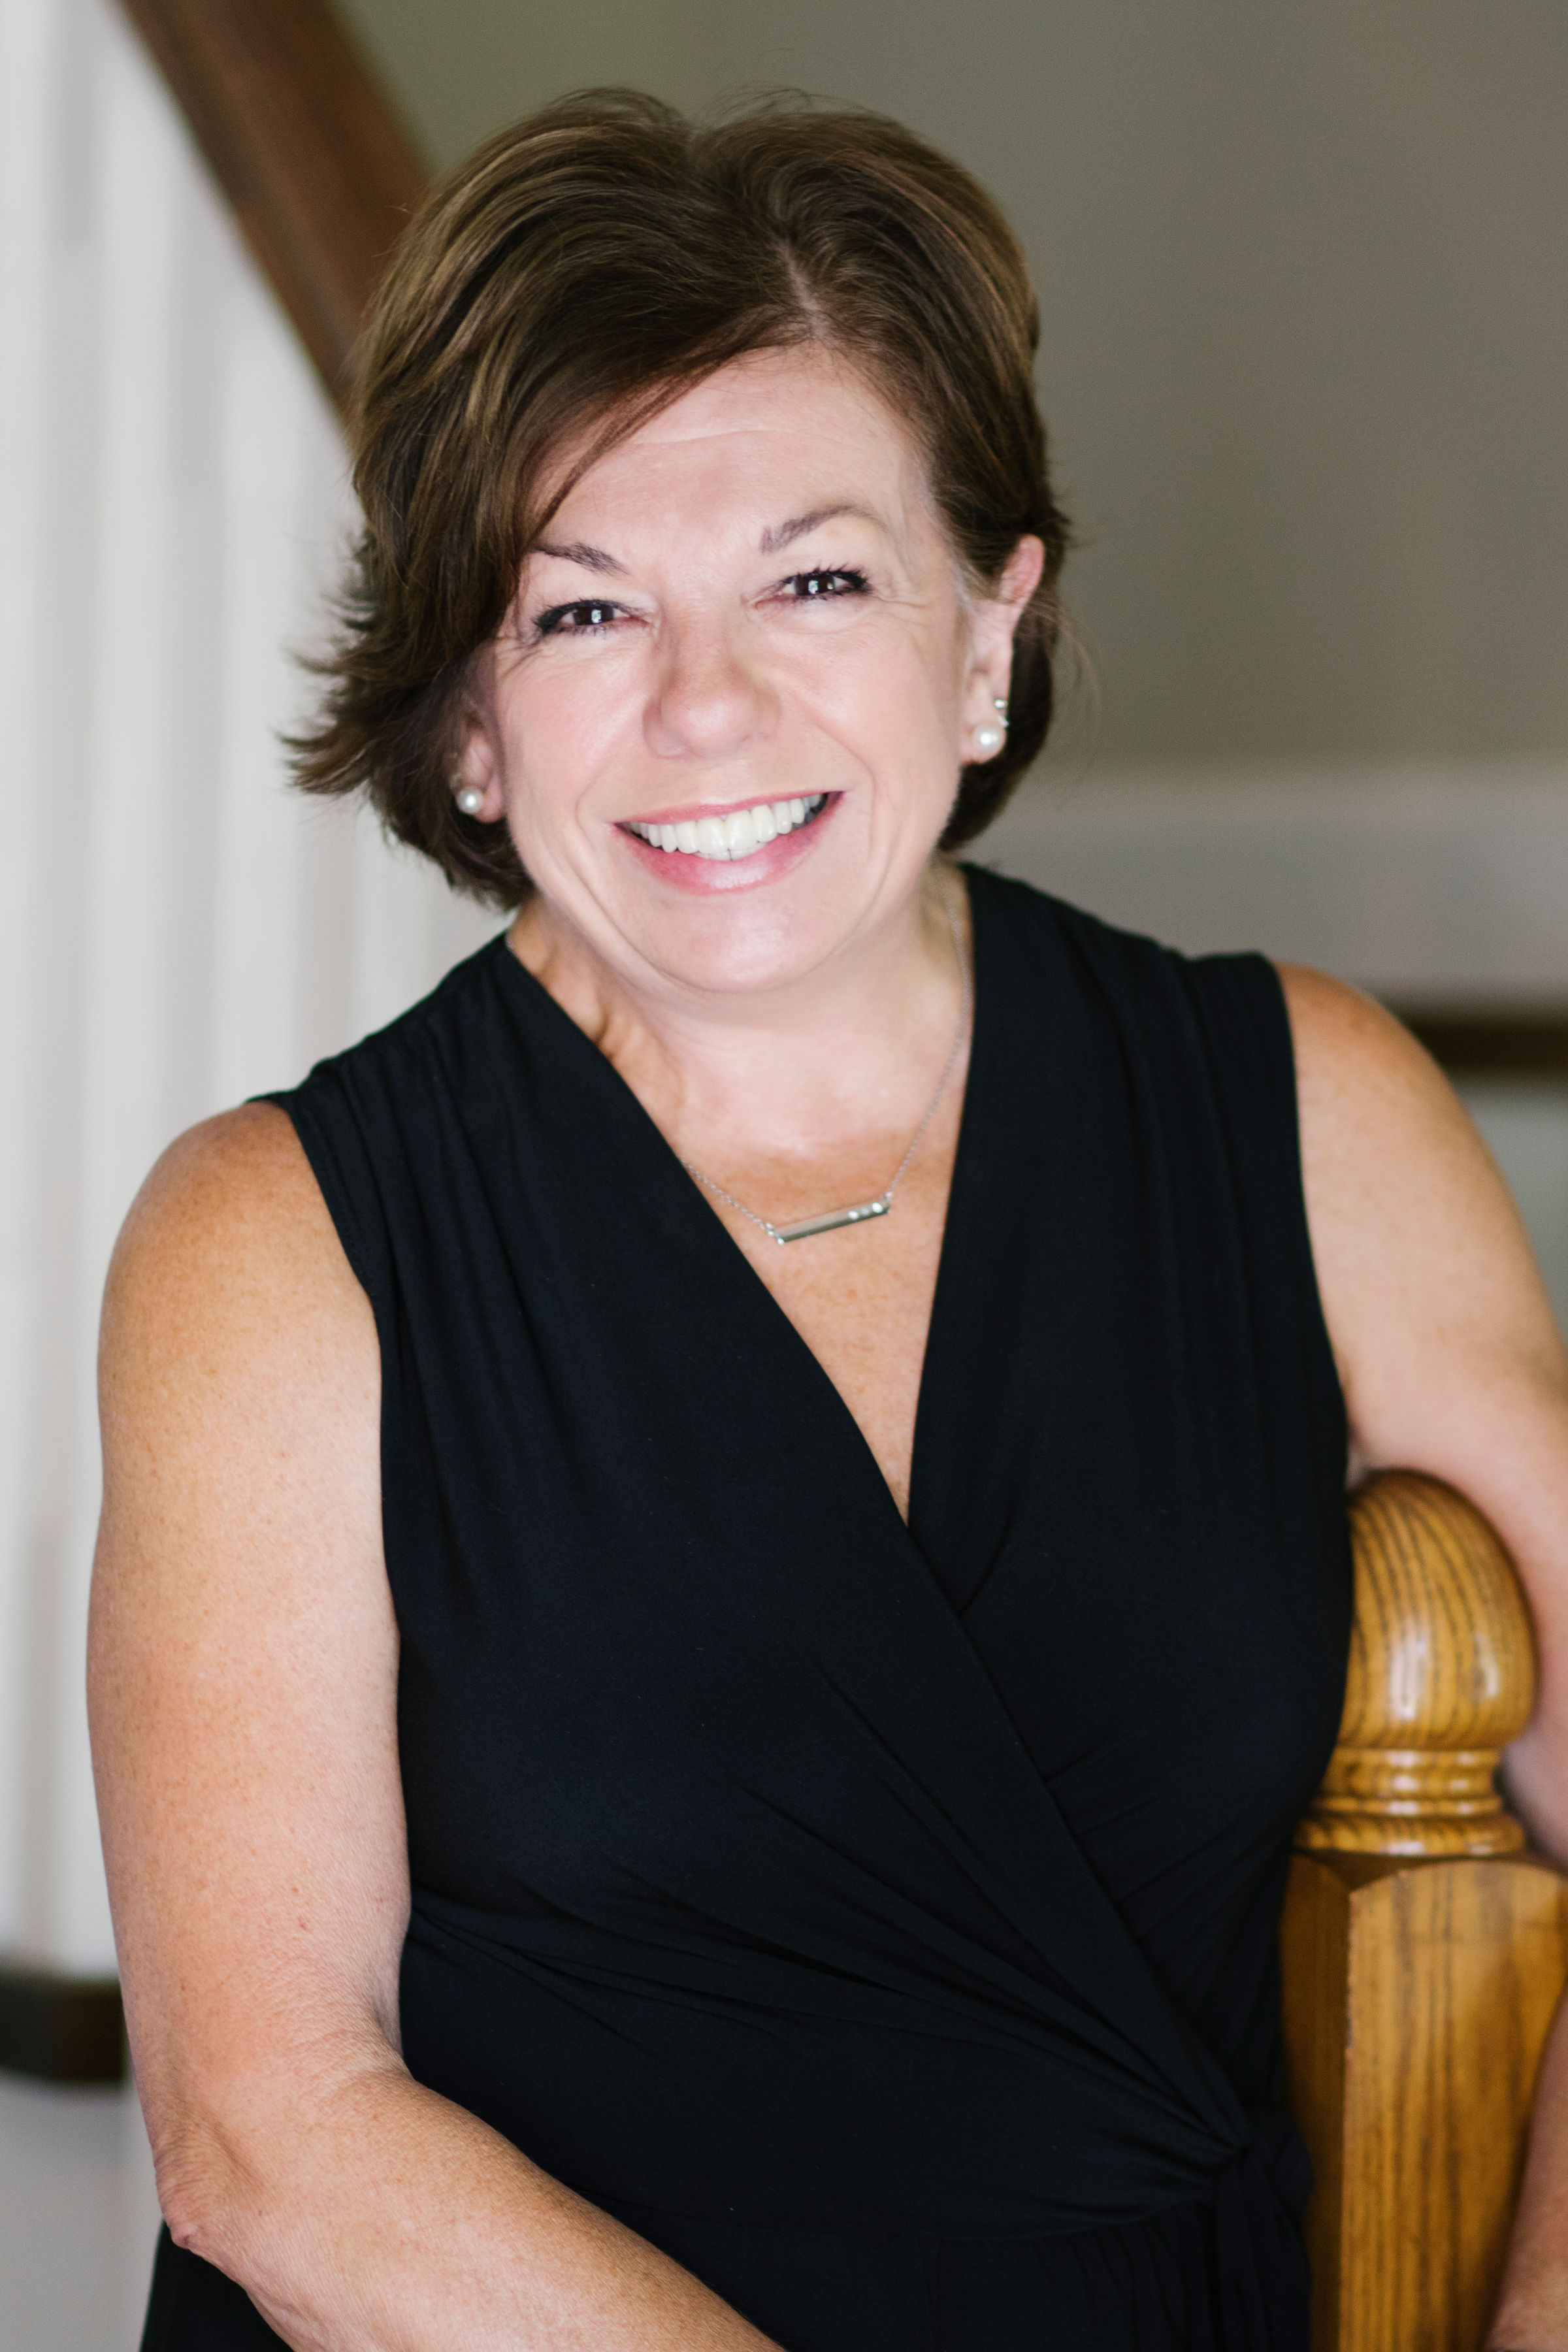 Kathy L. Schober